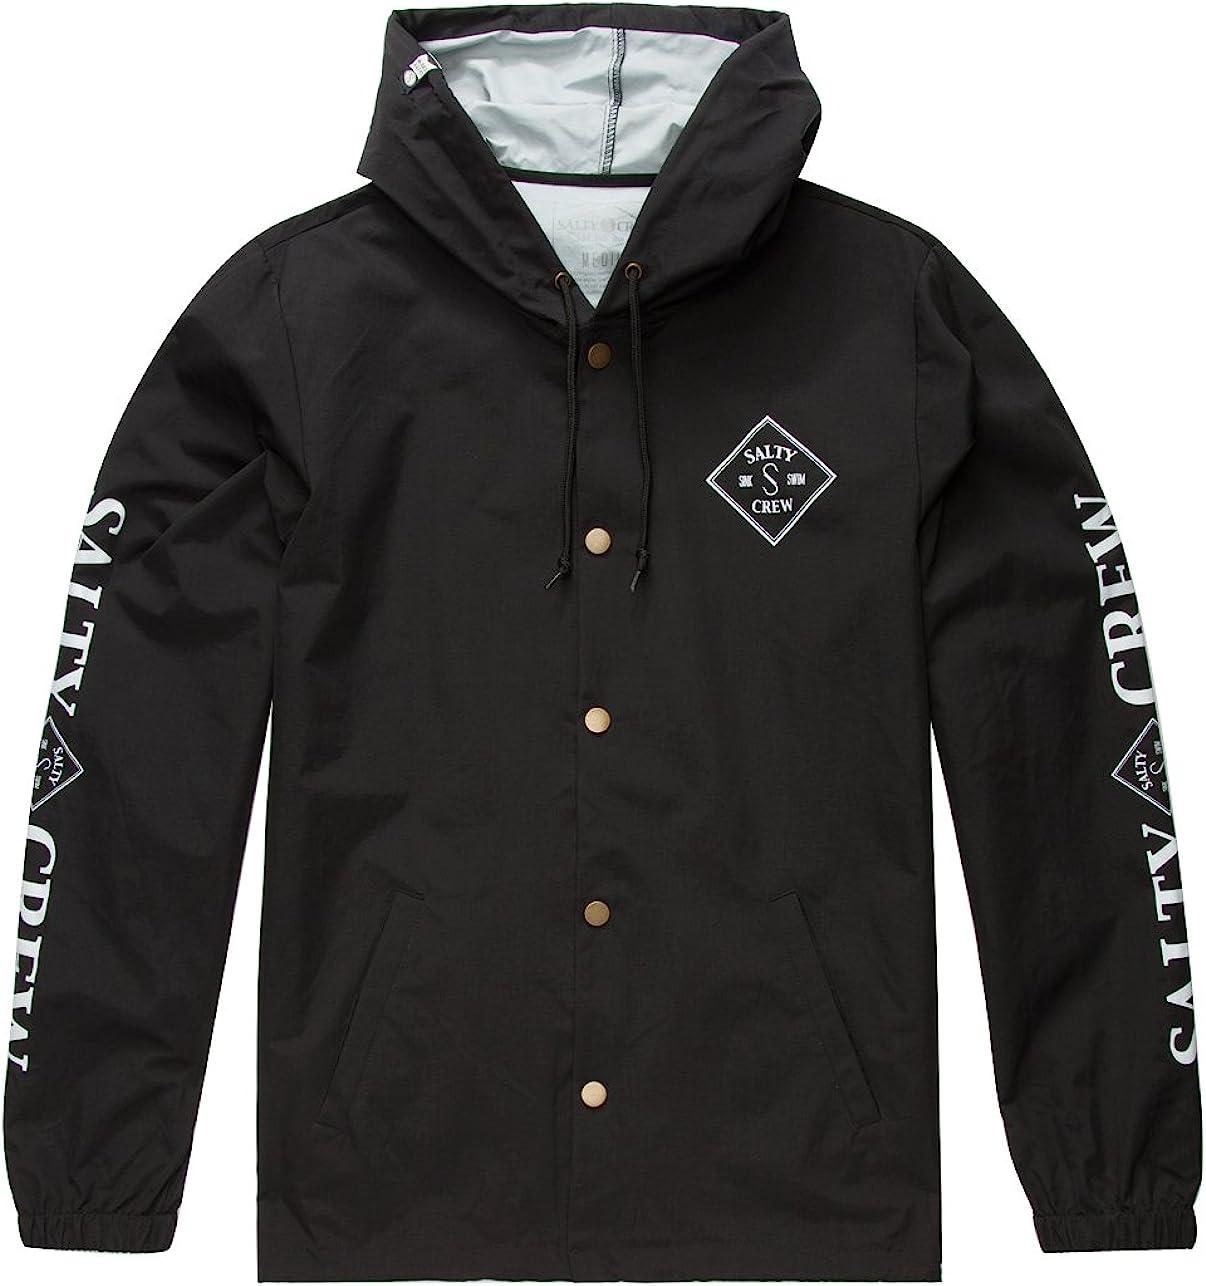 Salty Crew Tippet Jacket Genuine Atlanta Mall